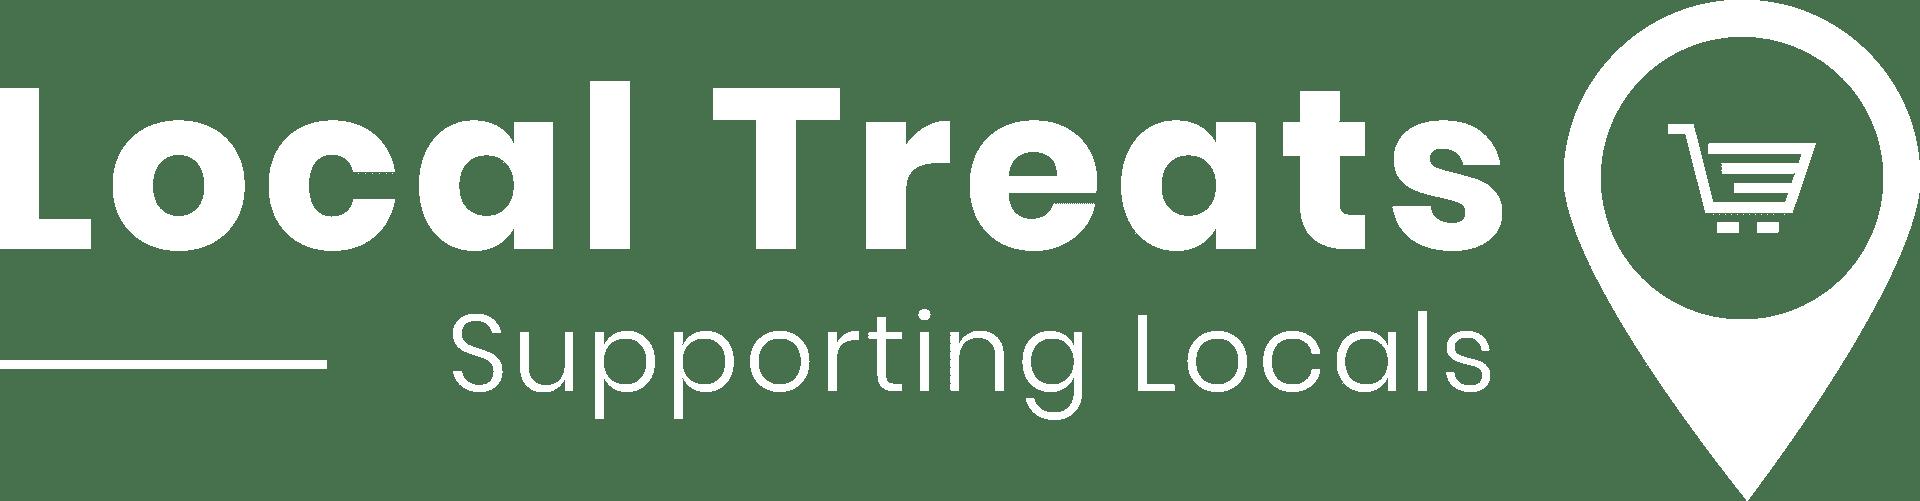 Local Treats NZ logo